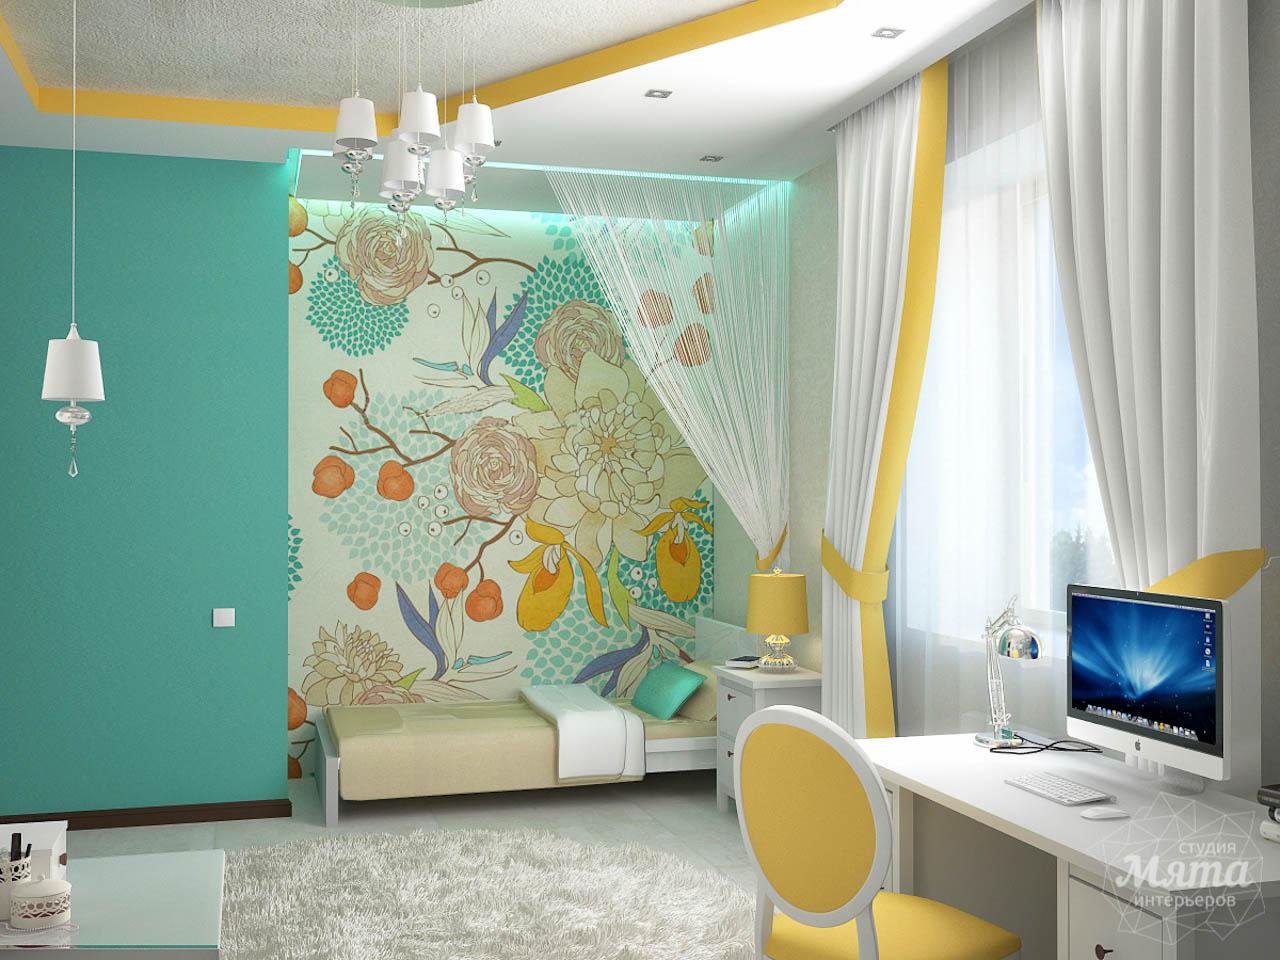 Дизайн проект интерьера коттеджа  в стиле минимализм по ул. Барвинка 15 img269557925